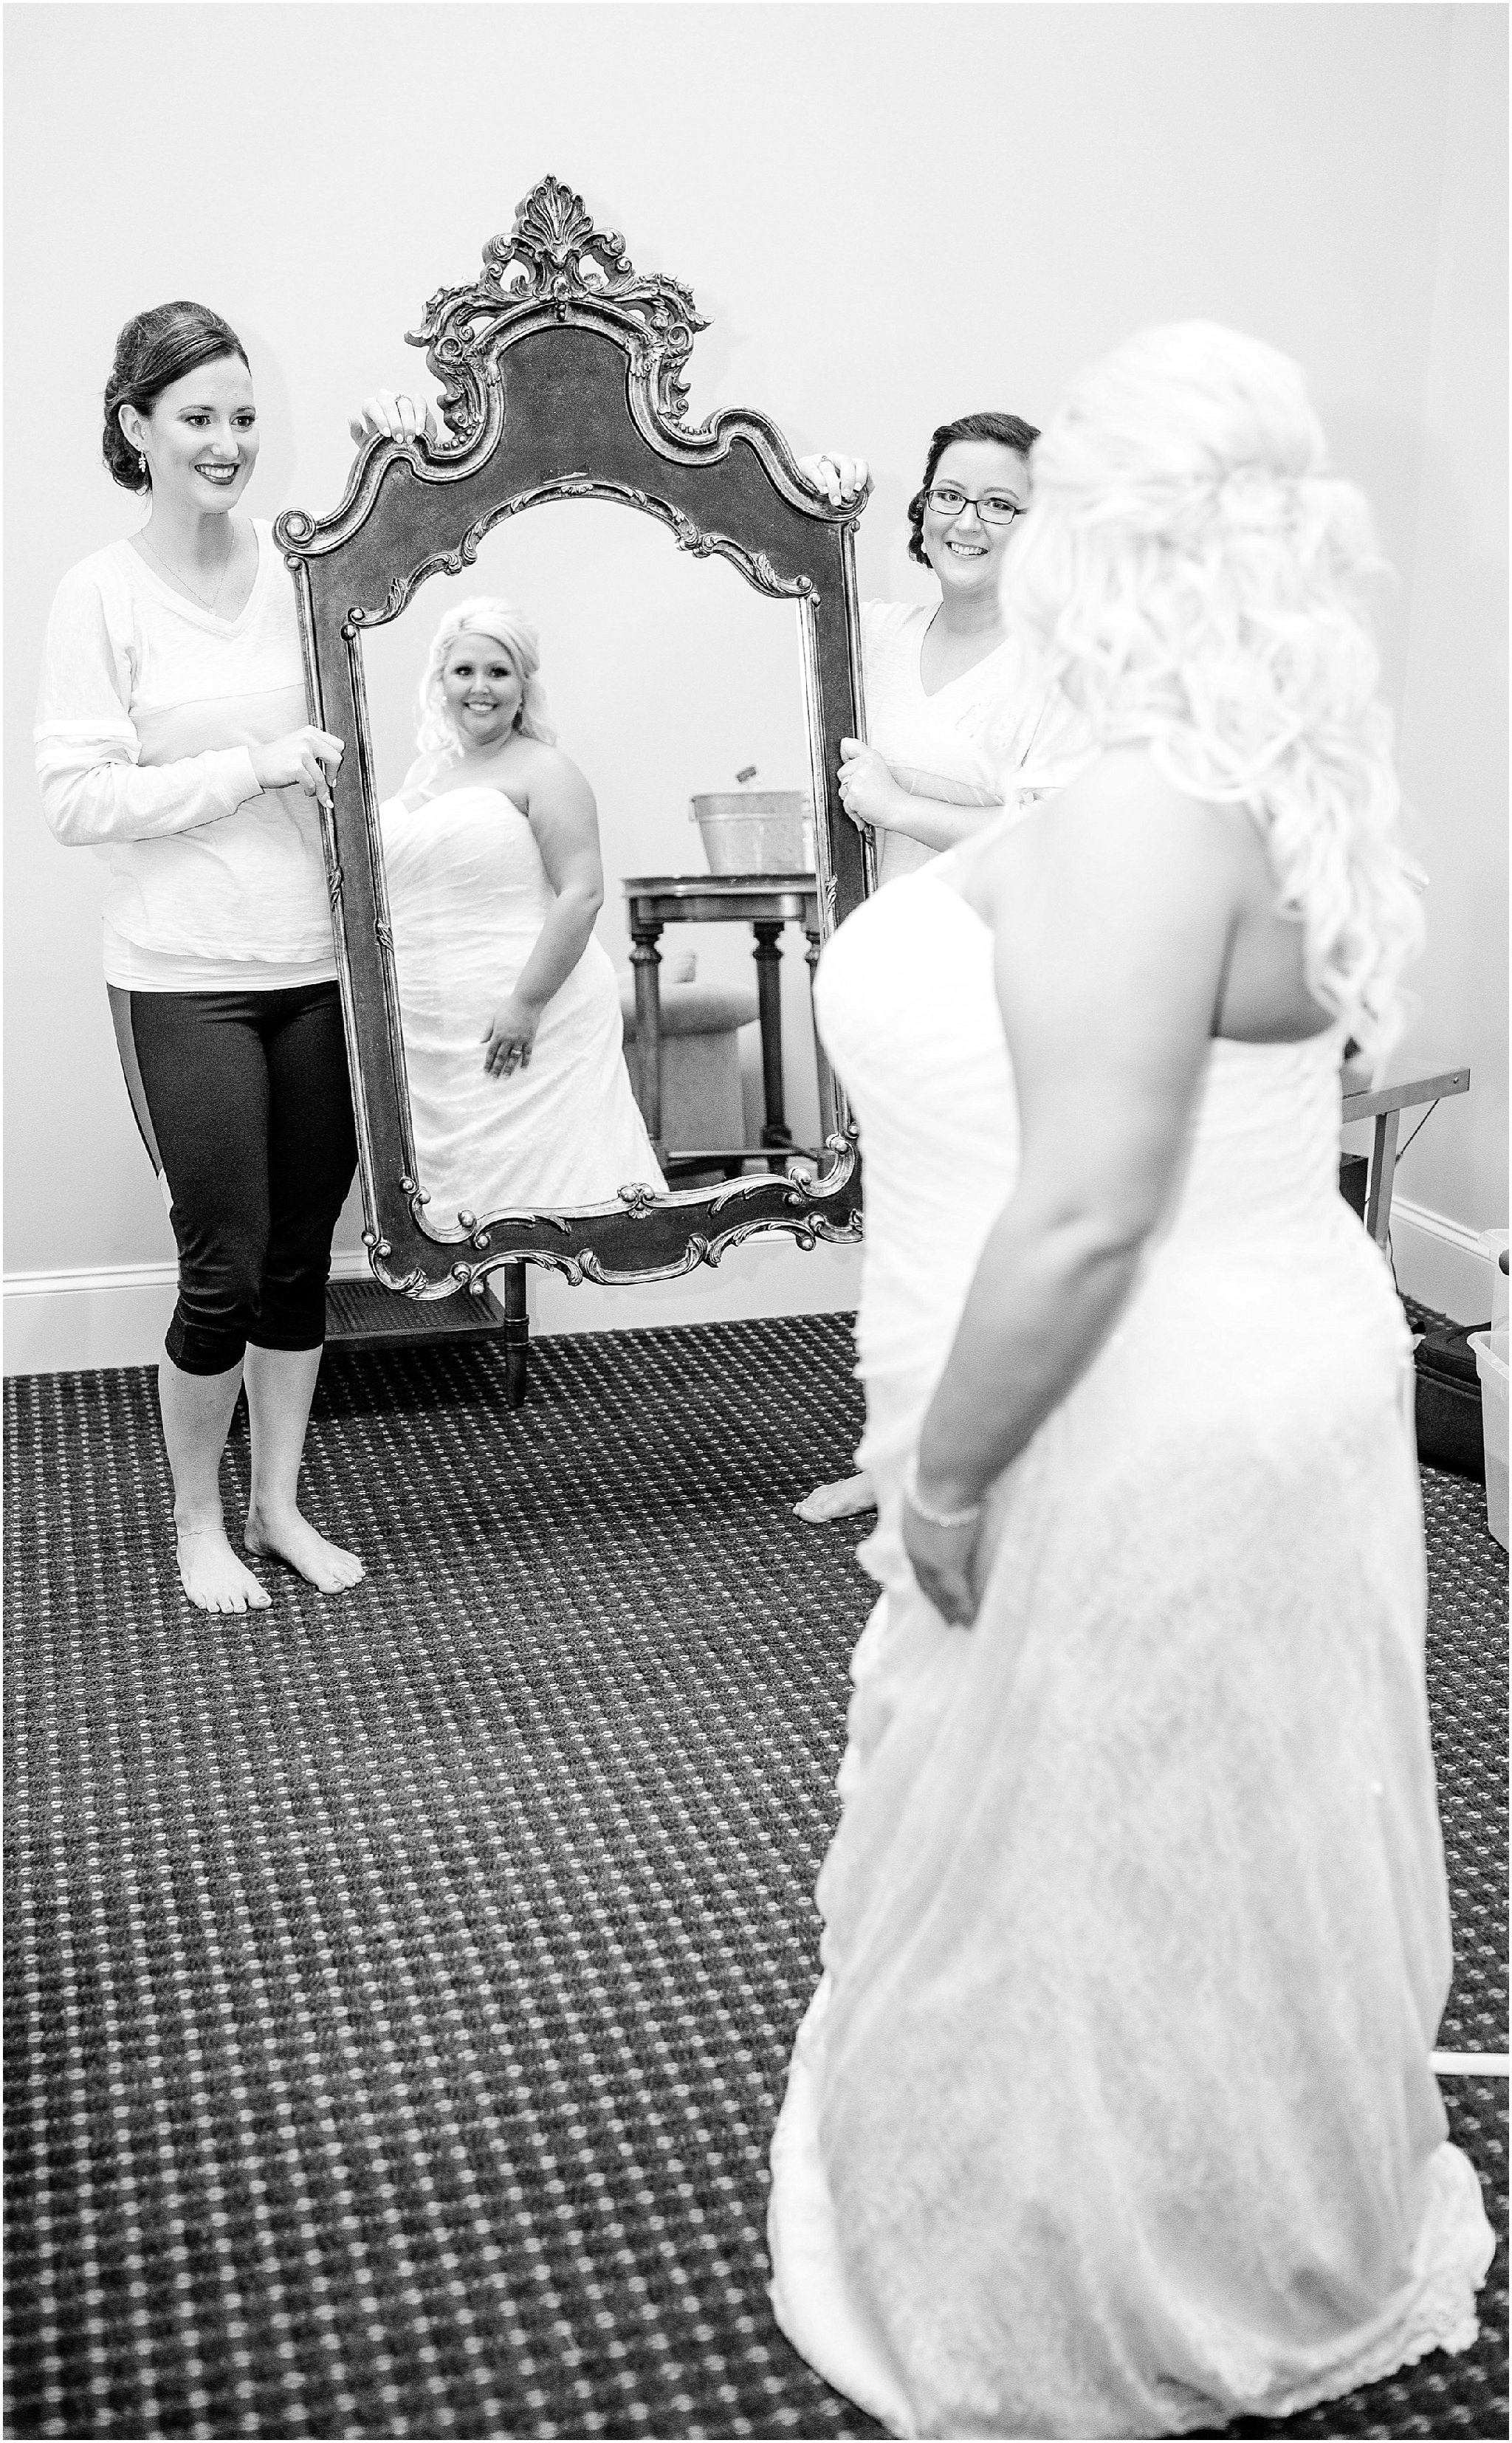 jessscott-milsboro-delaware-wedding-cassidymrphotography_0019